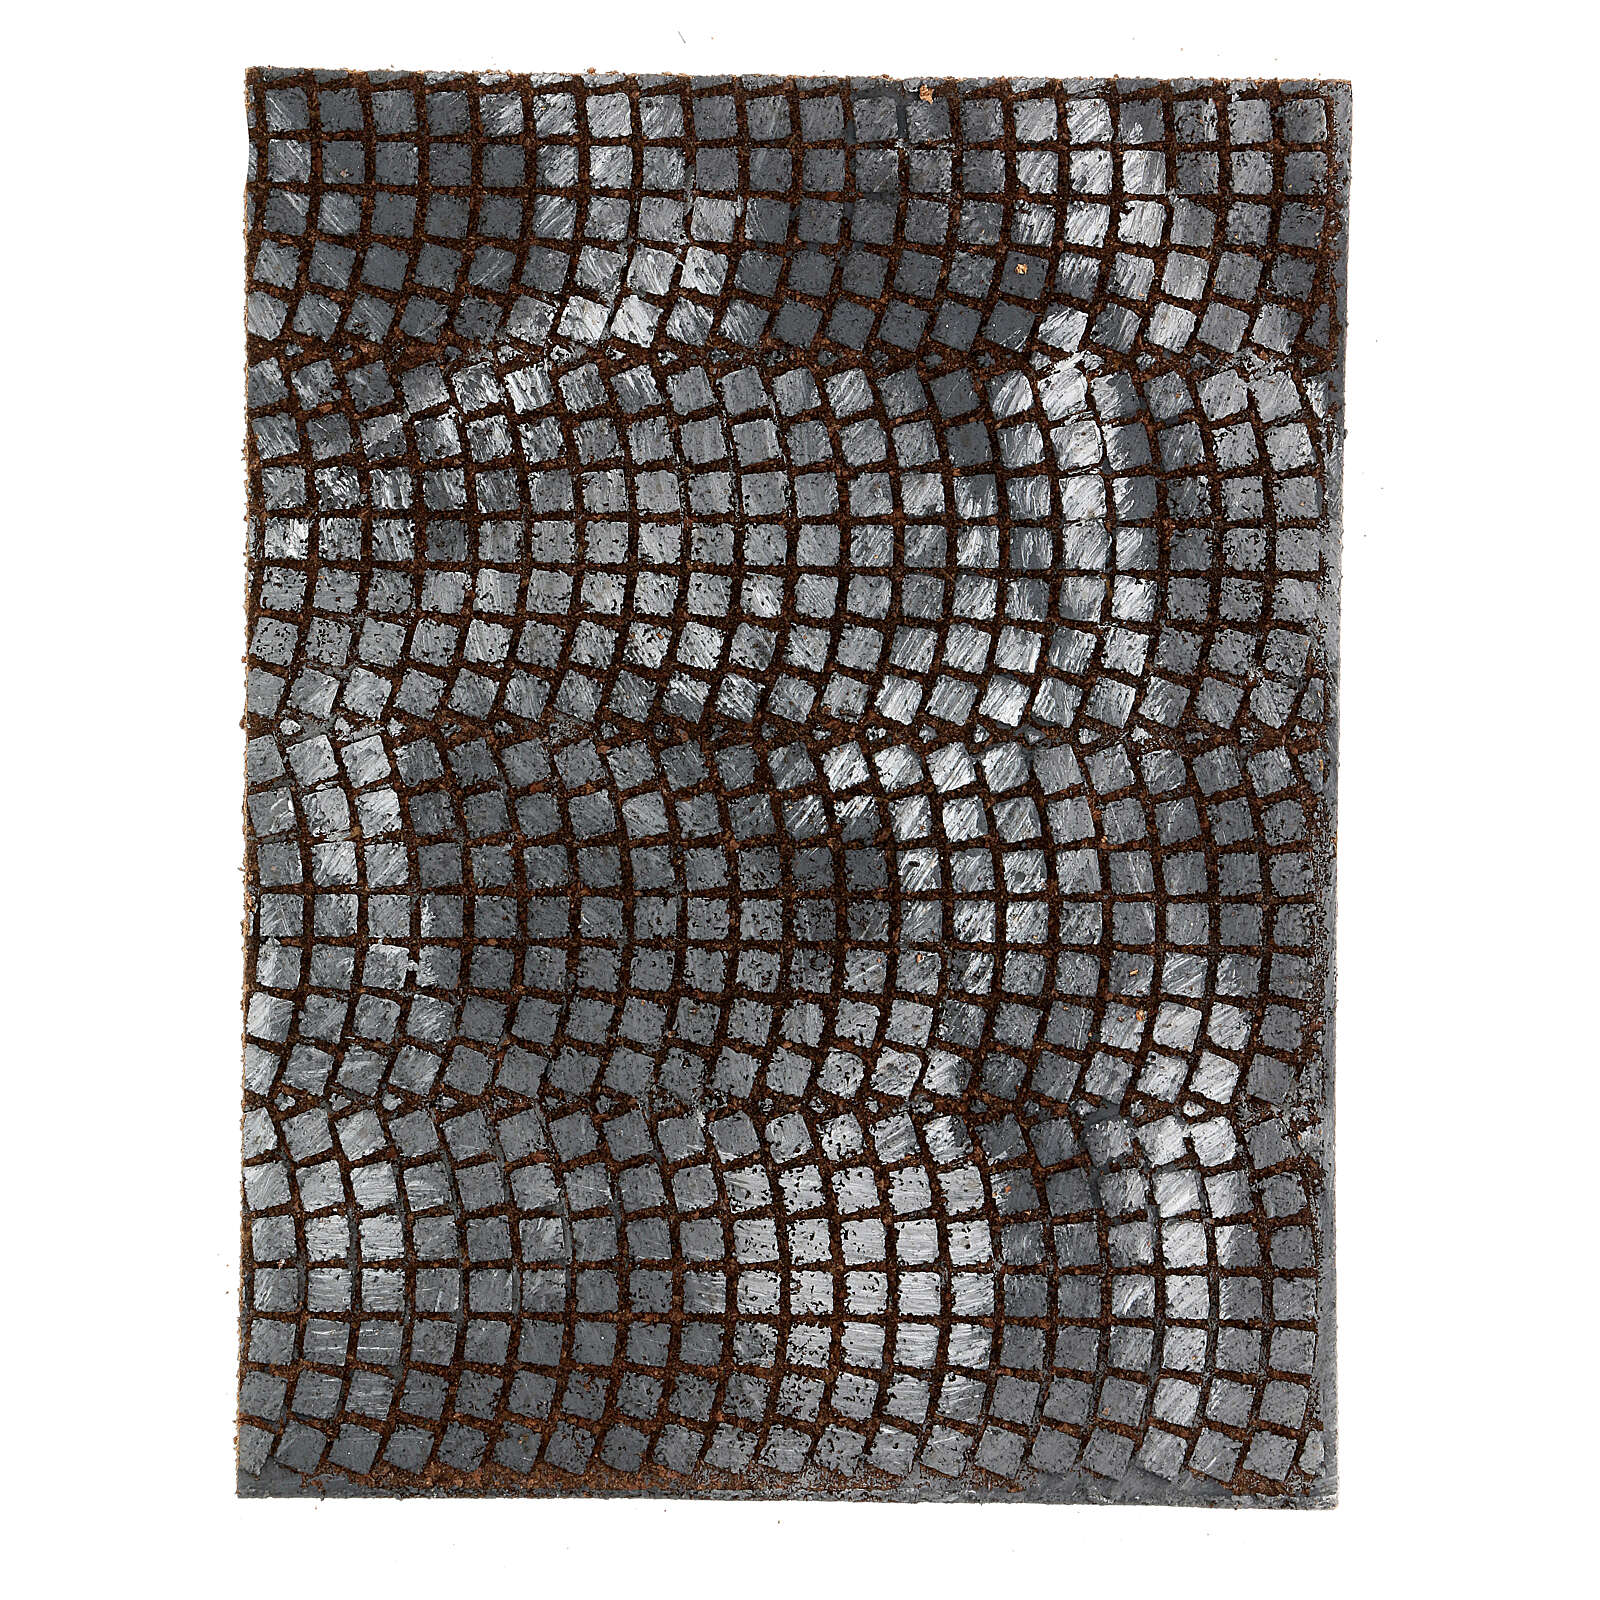 Pavimentação pedras cinzentas painel cortiça para presépio; medidas: 33x25x1 cm 4